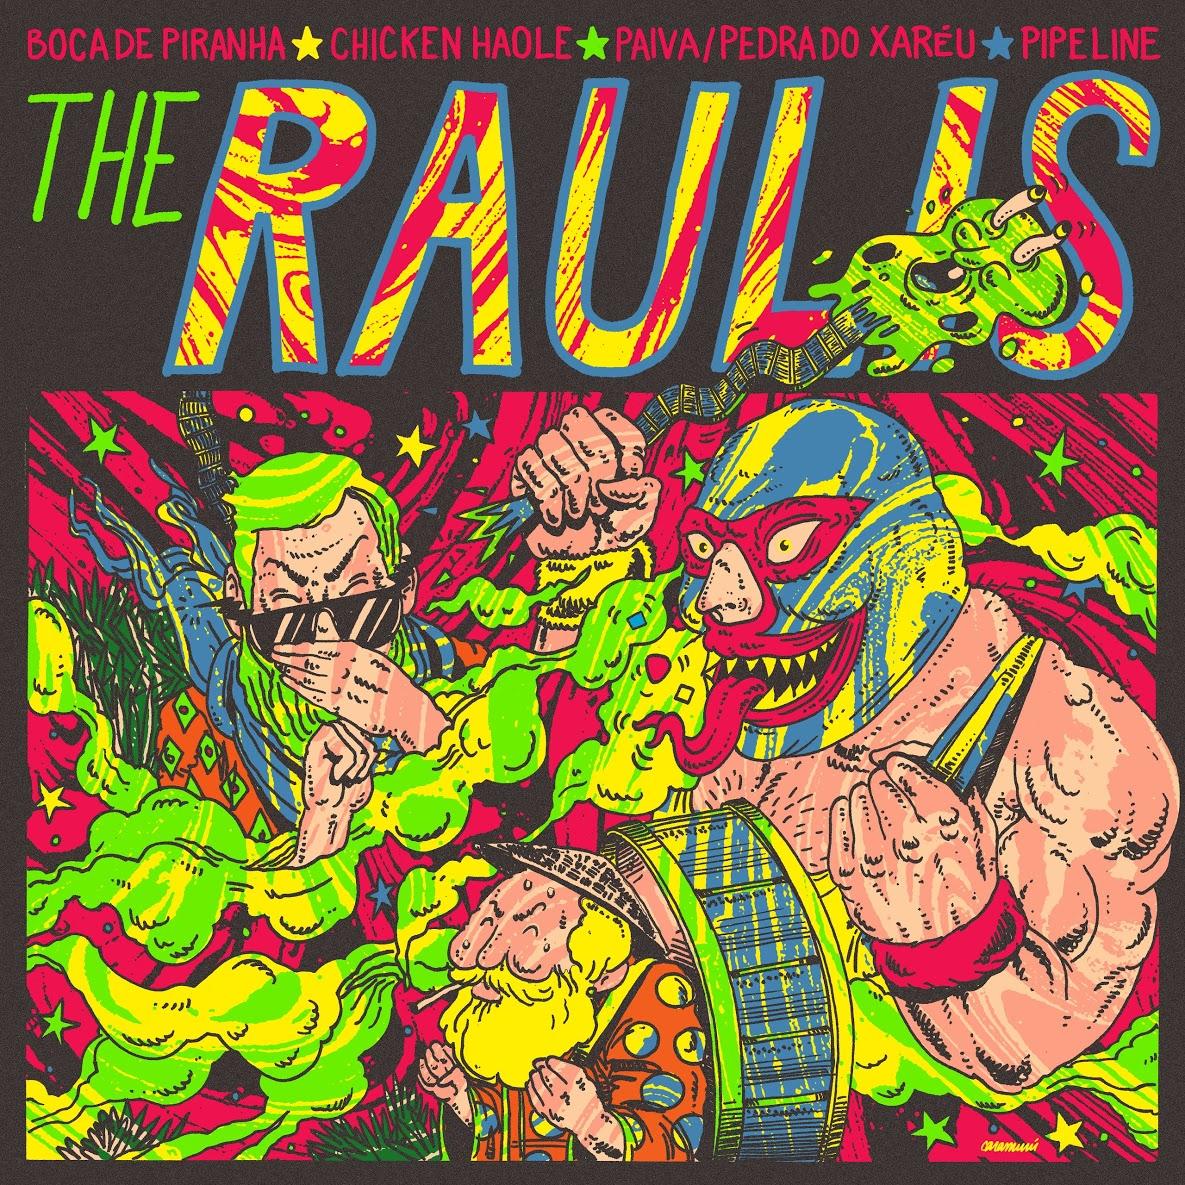 The Raulis - The Raulis EP